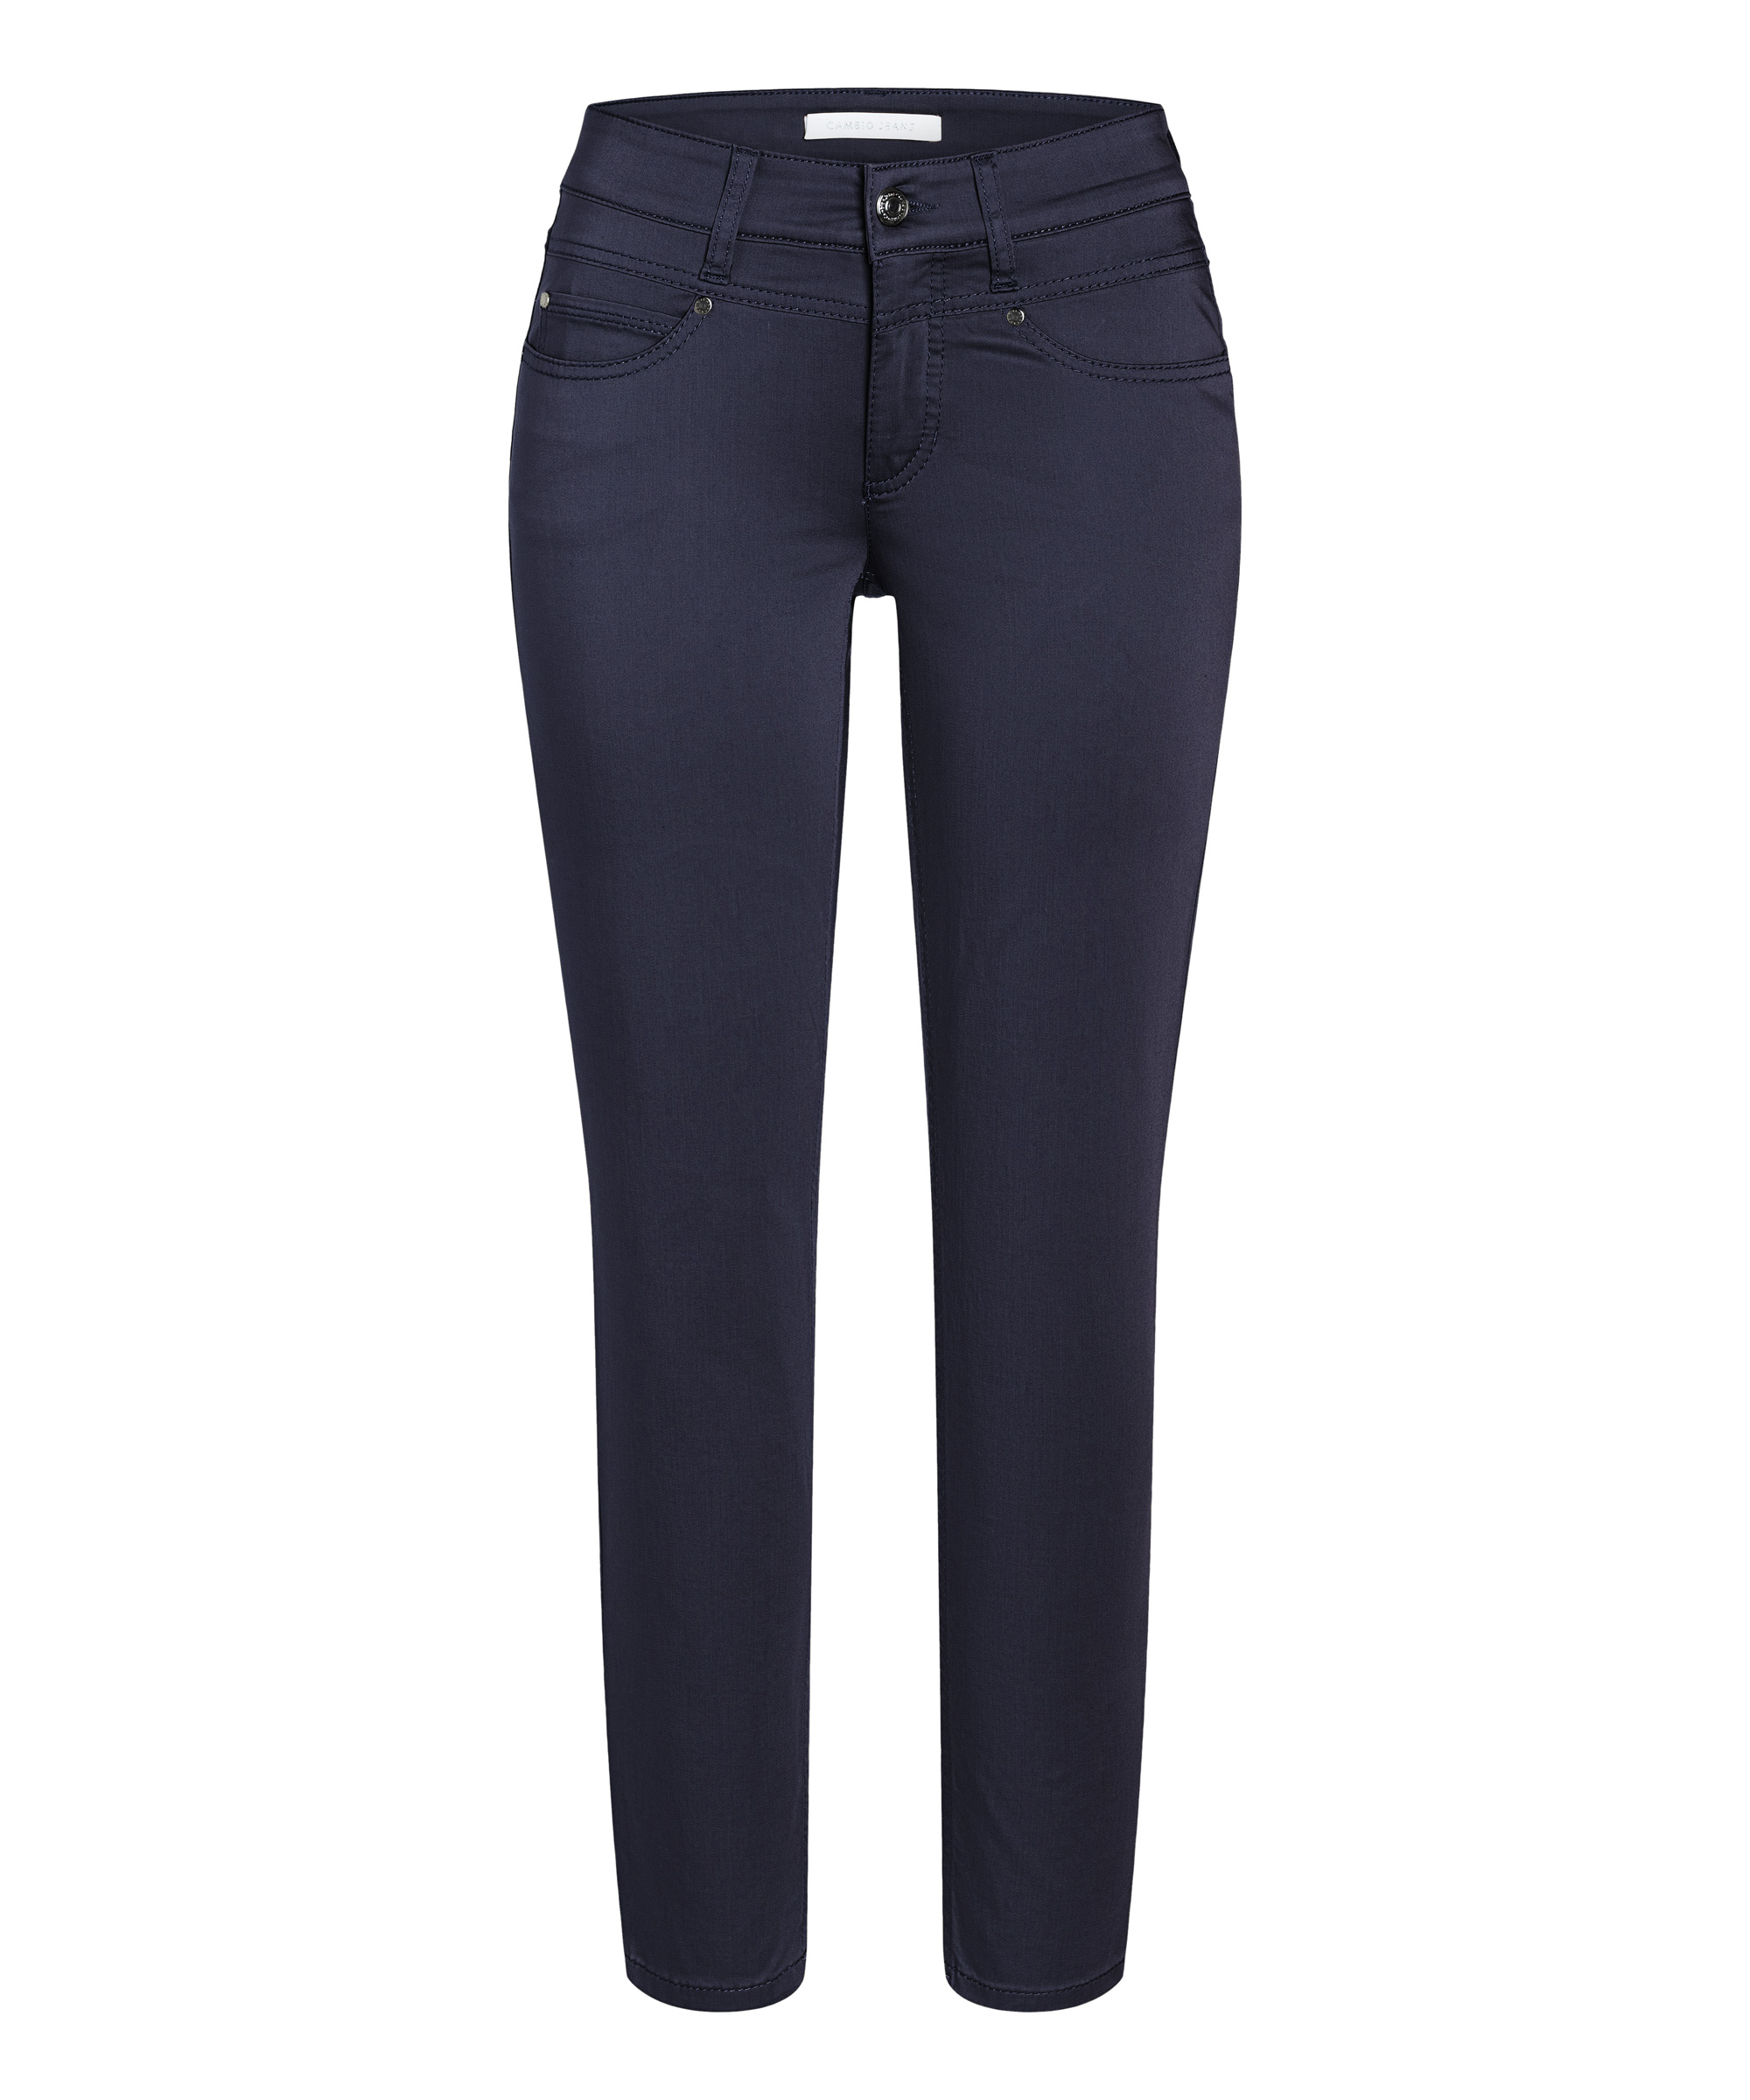 Cambio Jeans Posh MARINE